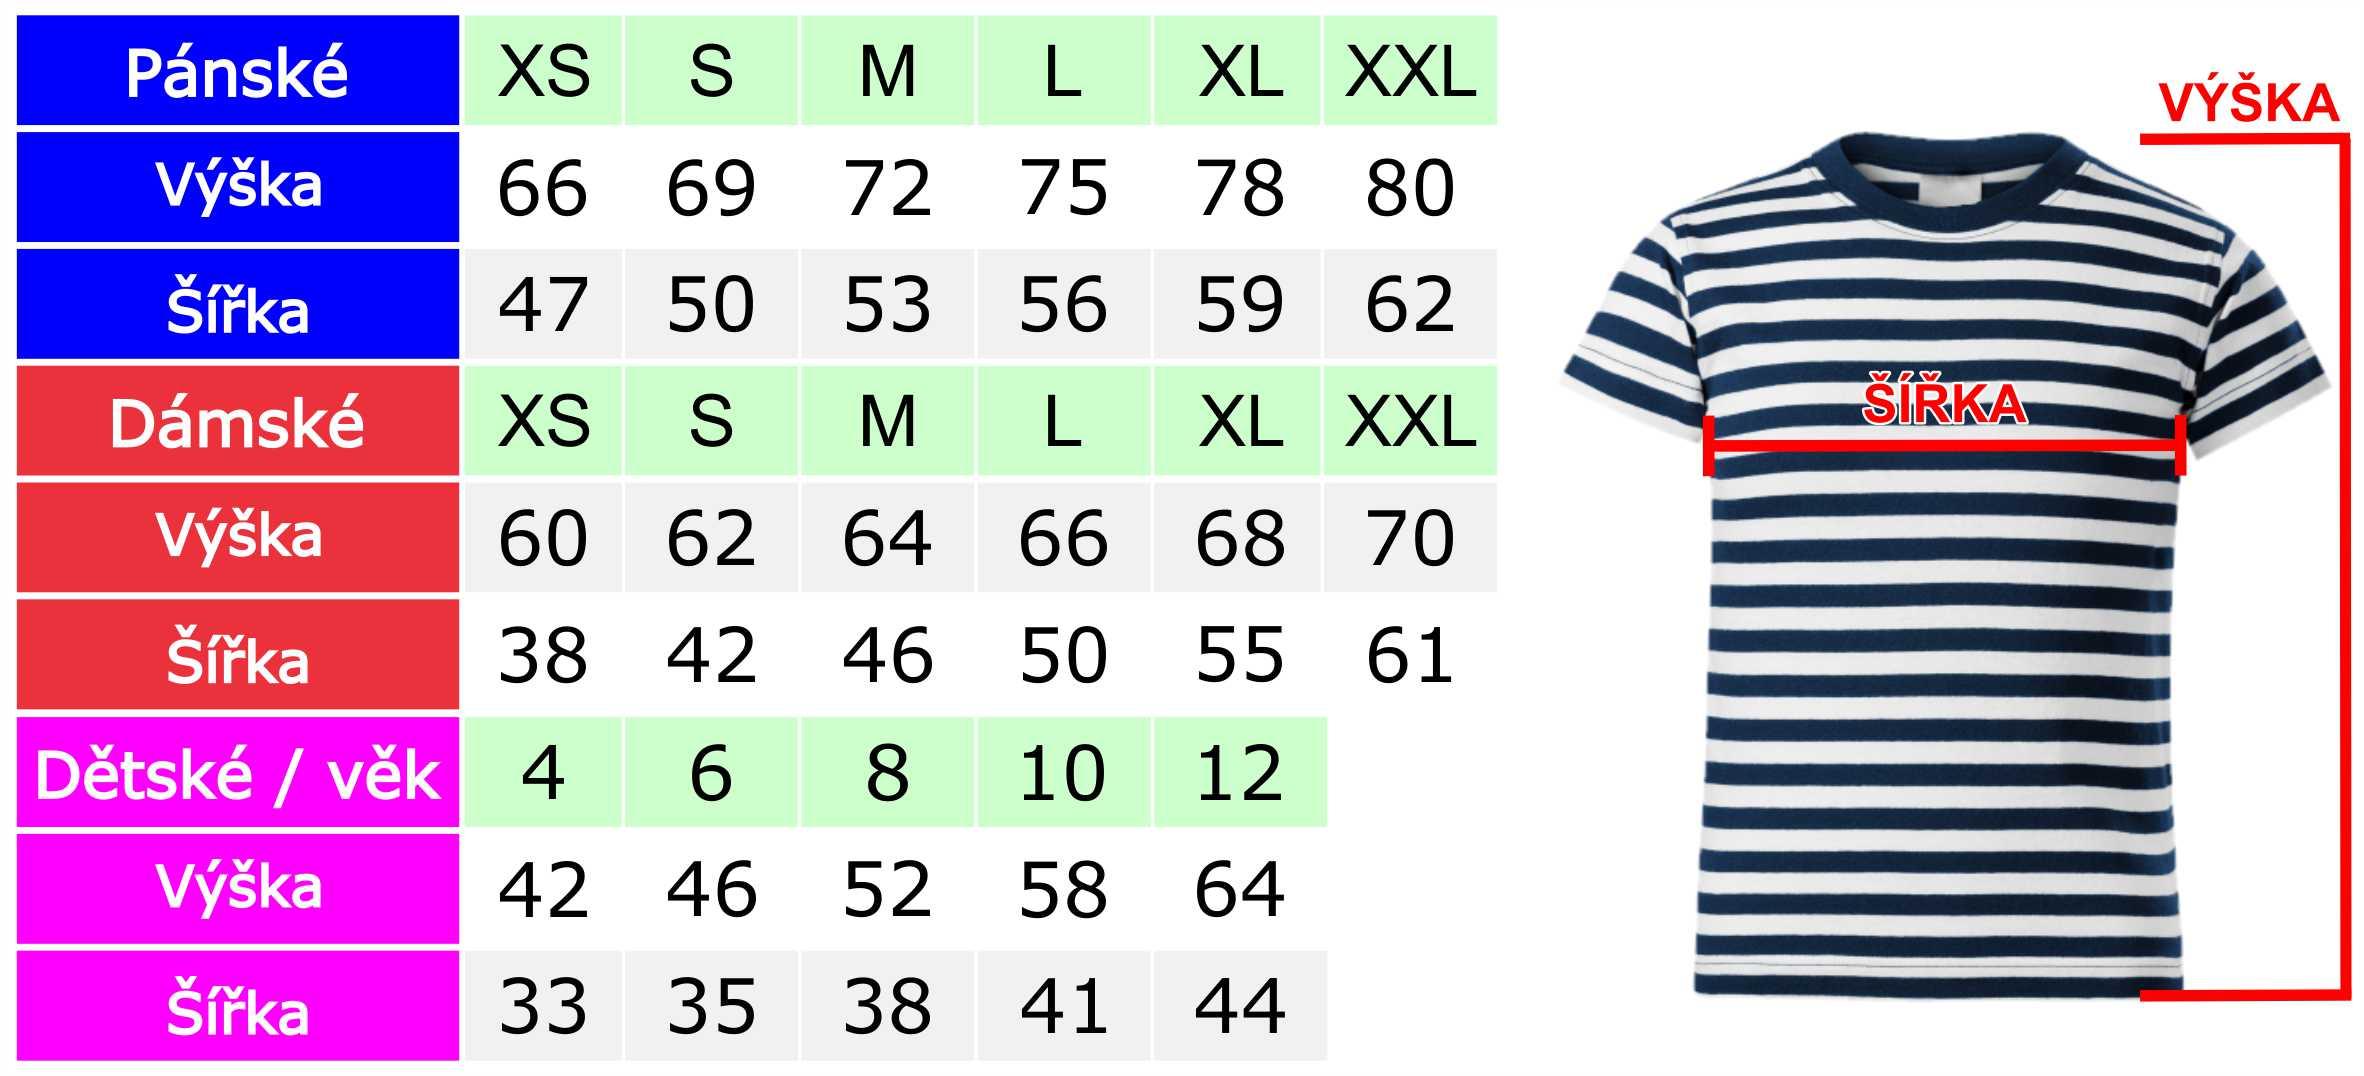 Tabulka velikostí námořnických triček